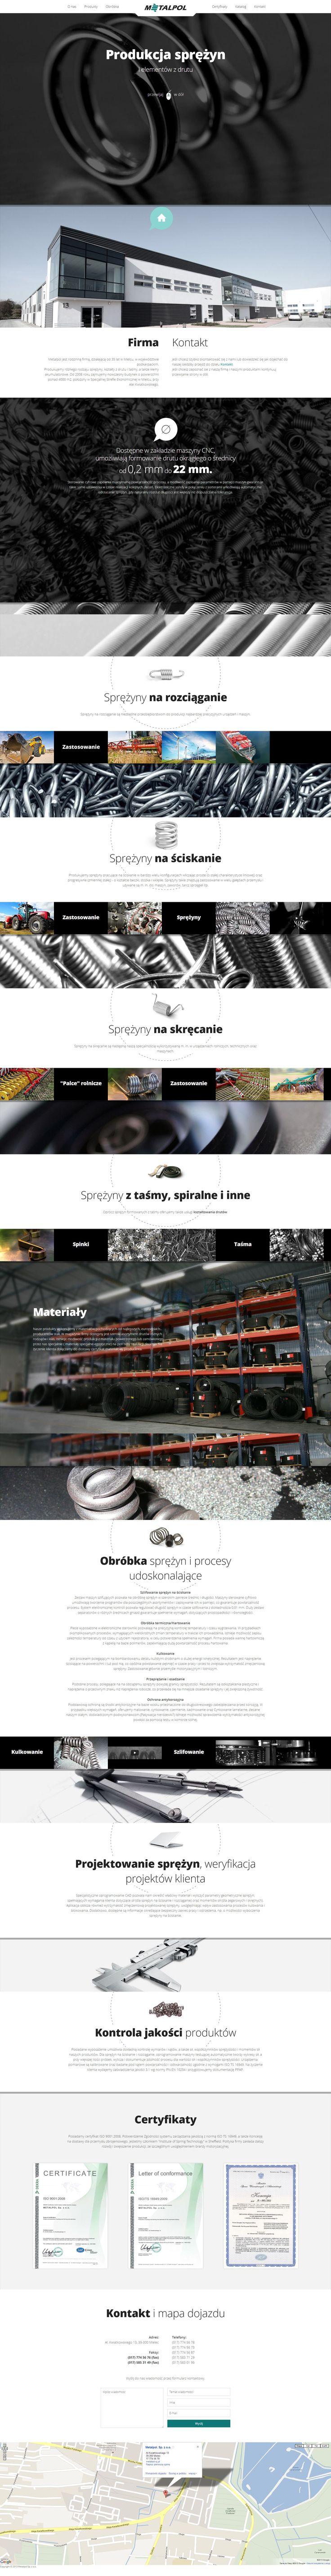 www.metalpol-sj.pl